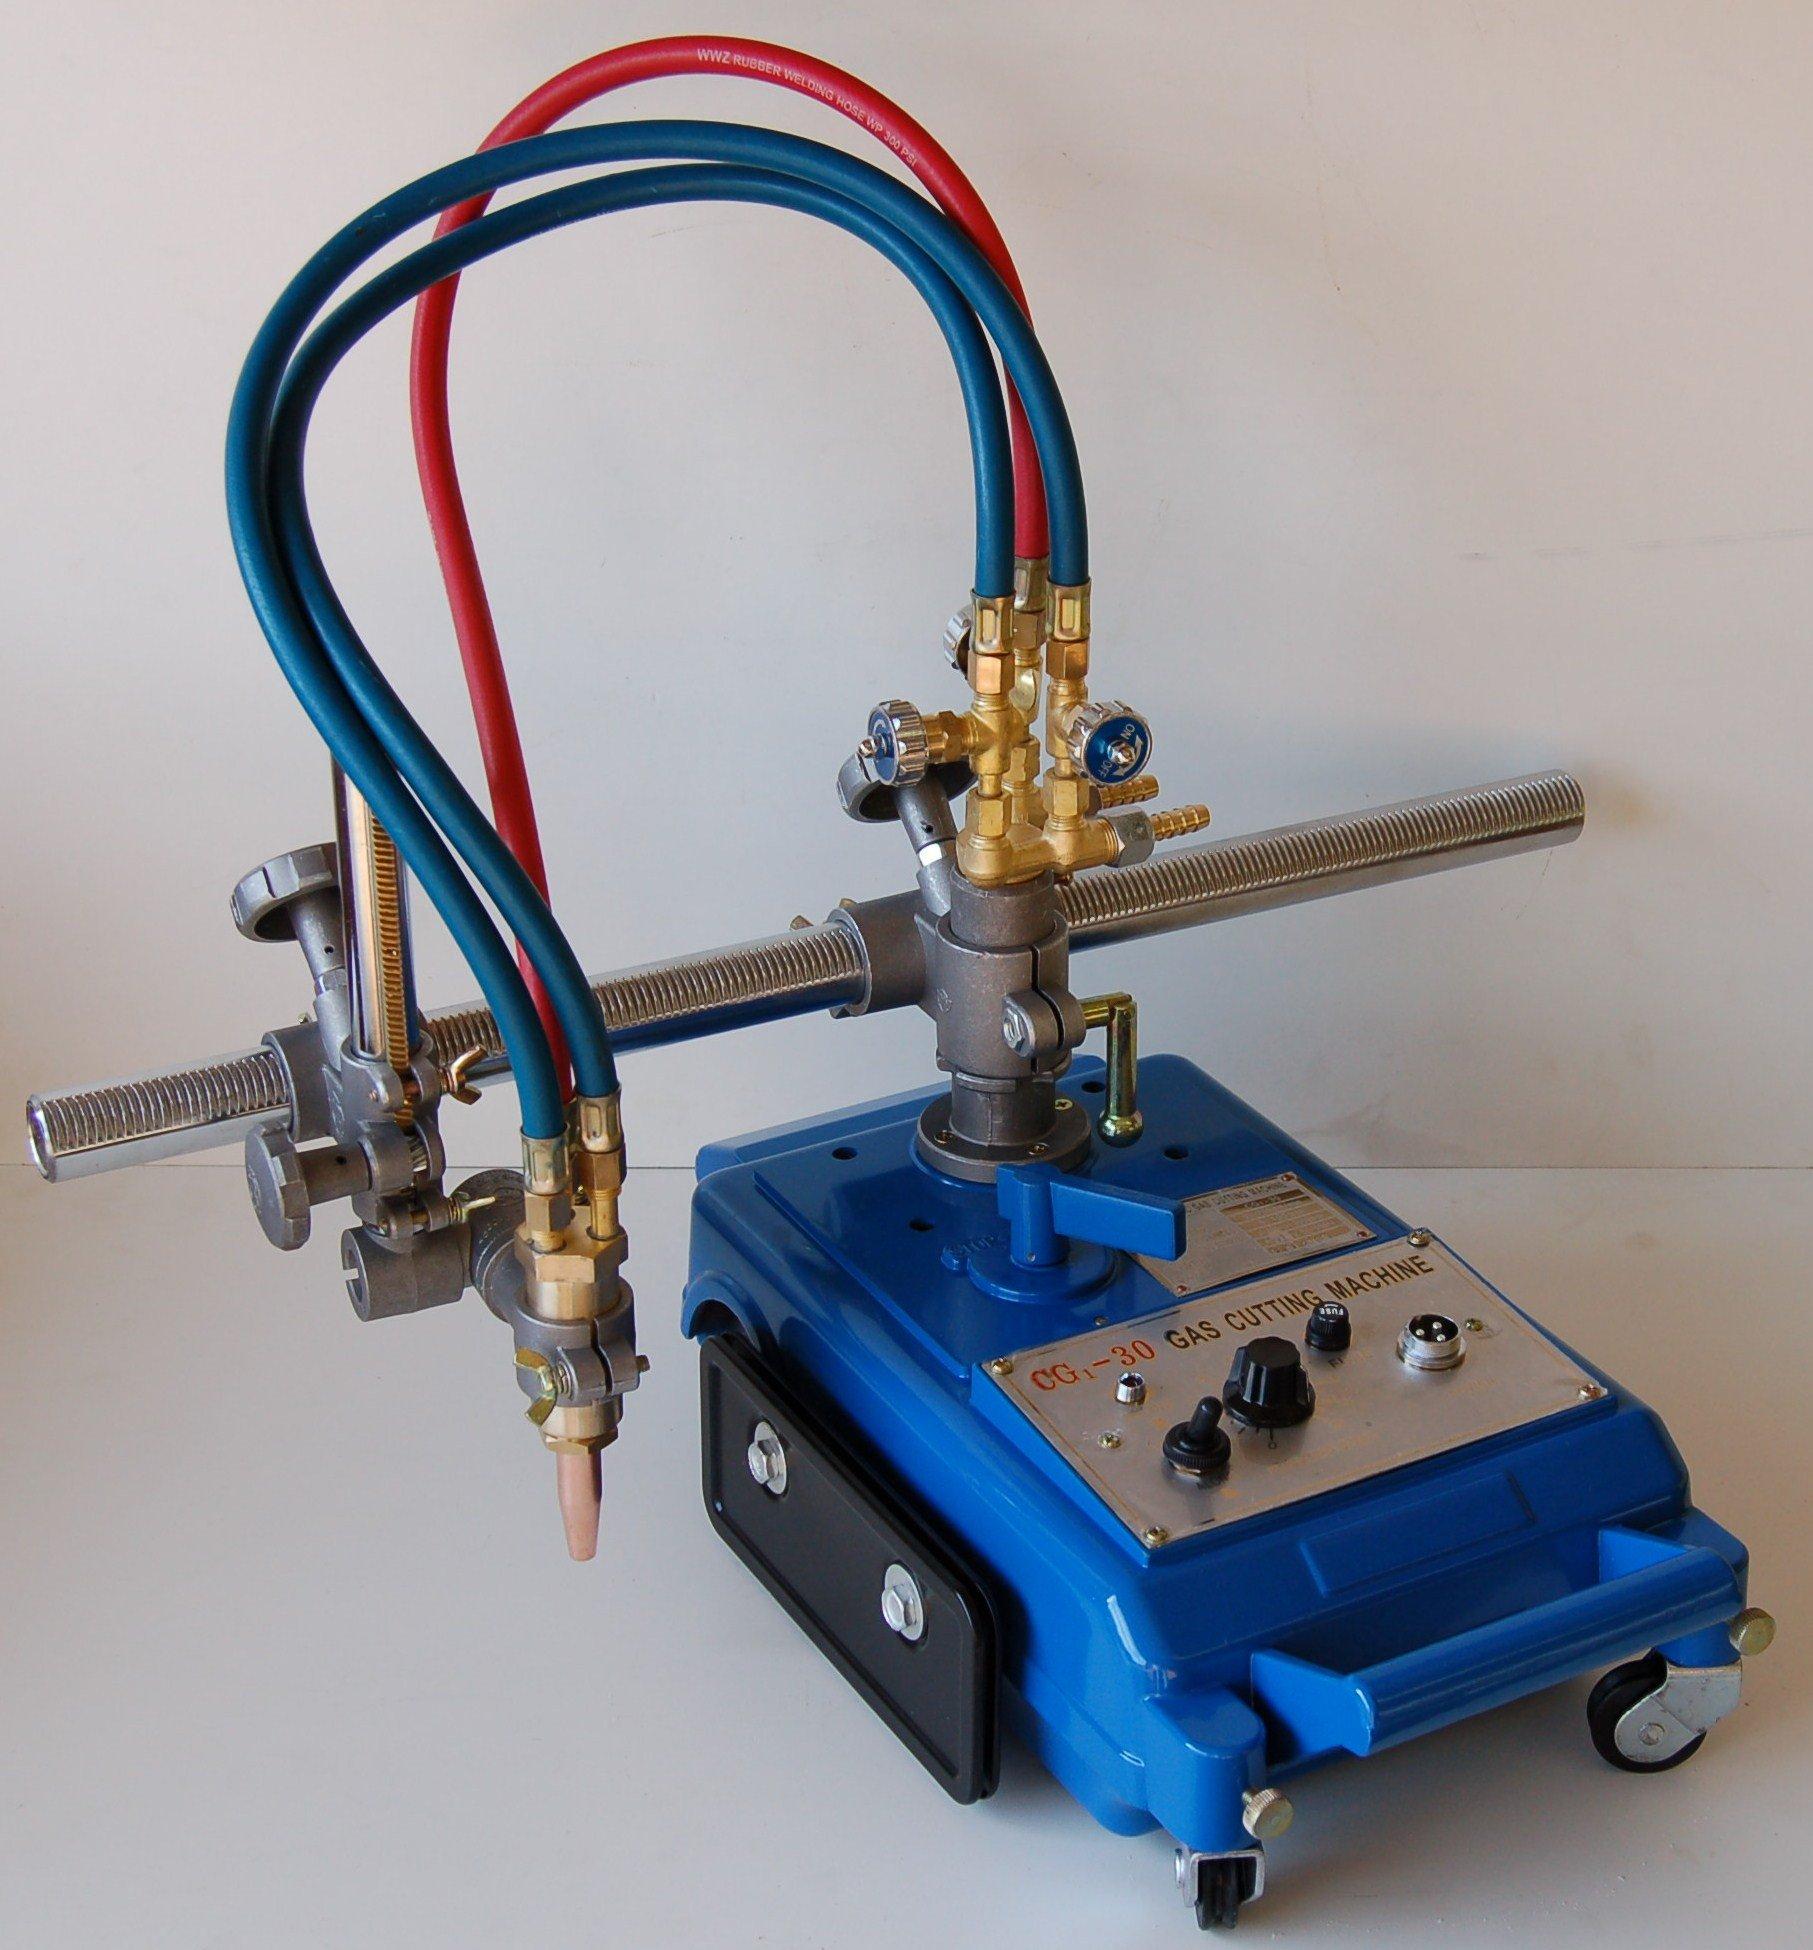 CG-30 Track Torch - Metal Cutting Track Burner by BLUEROCK ® Tools